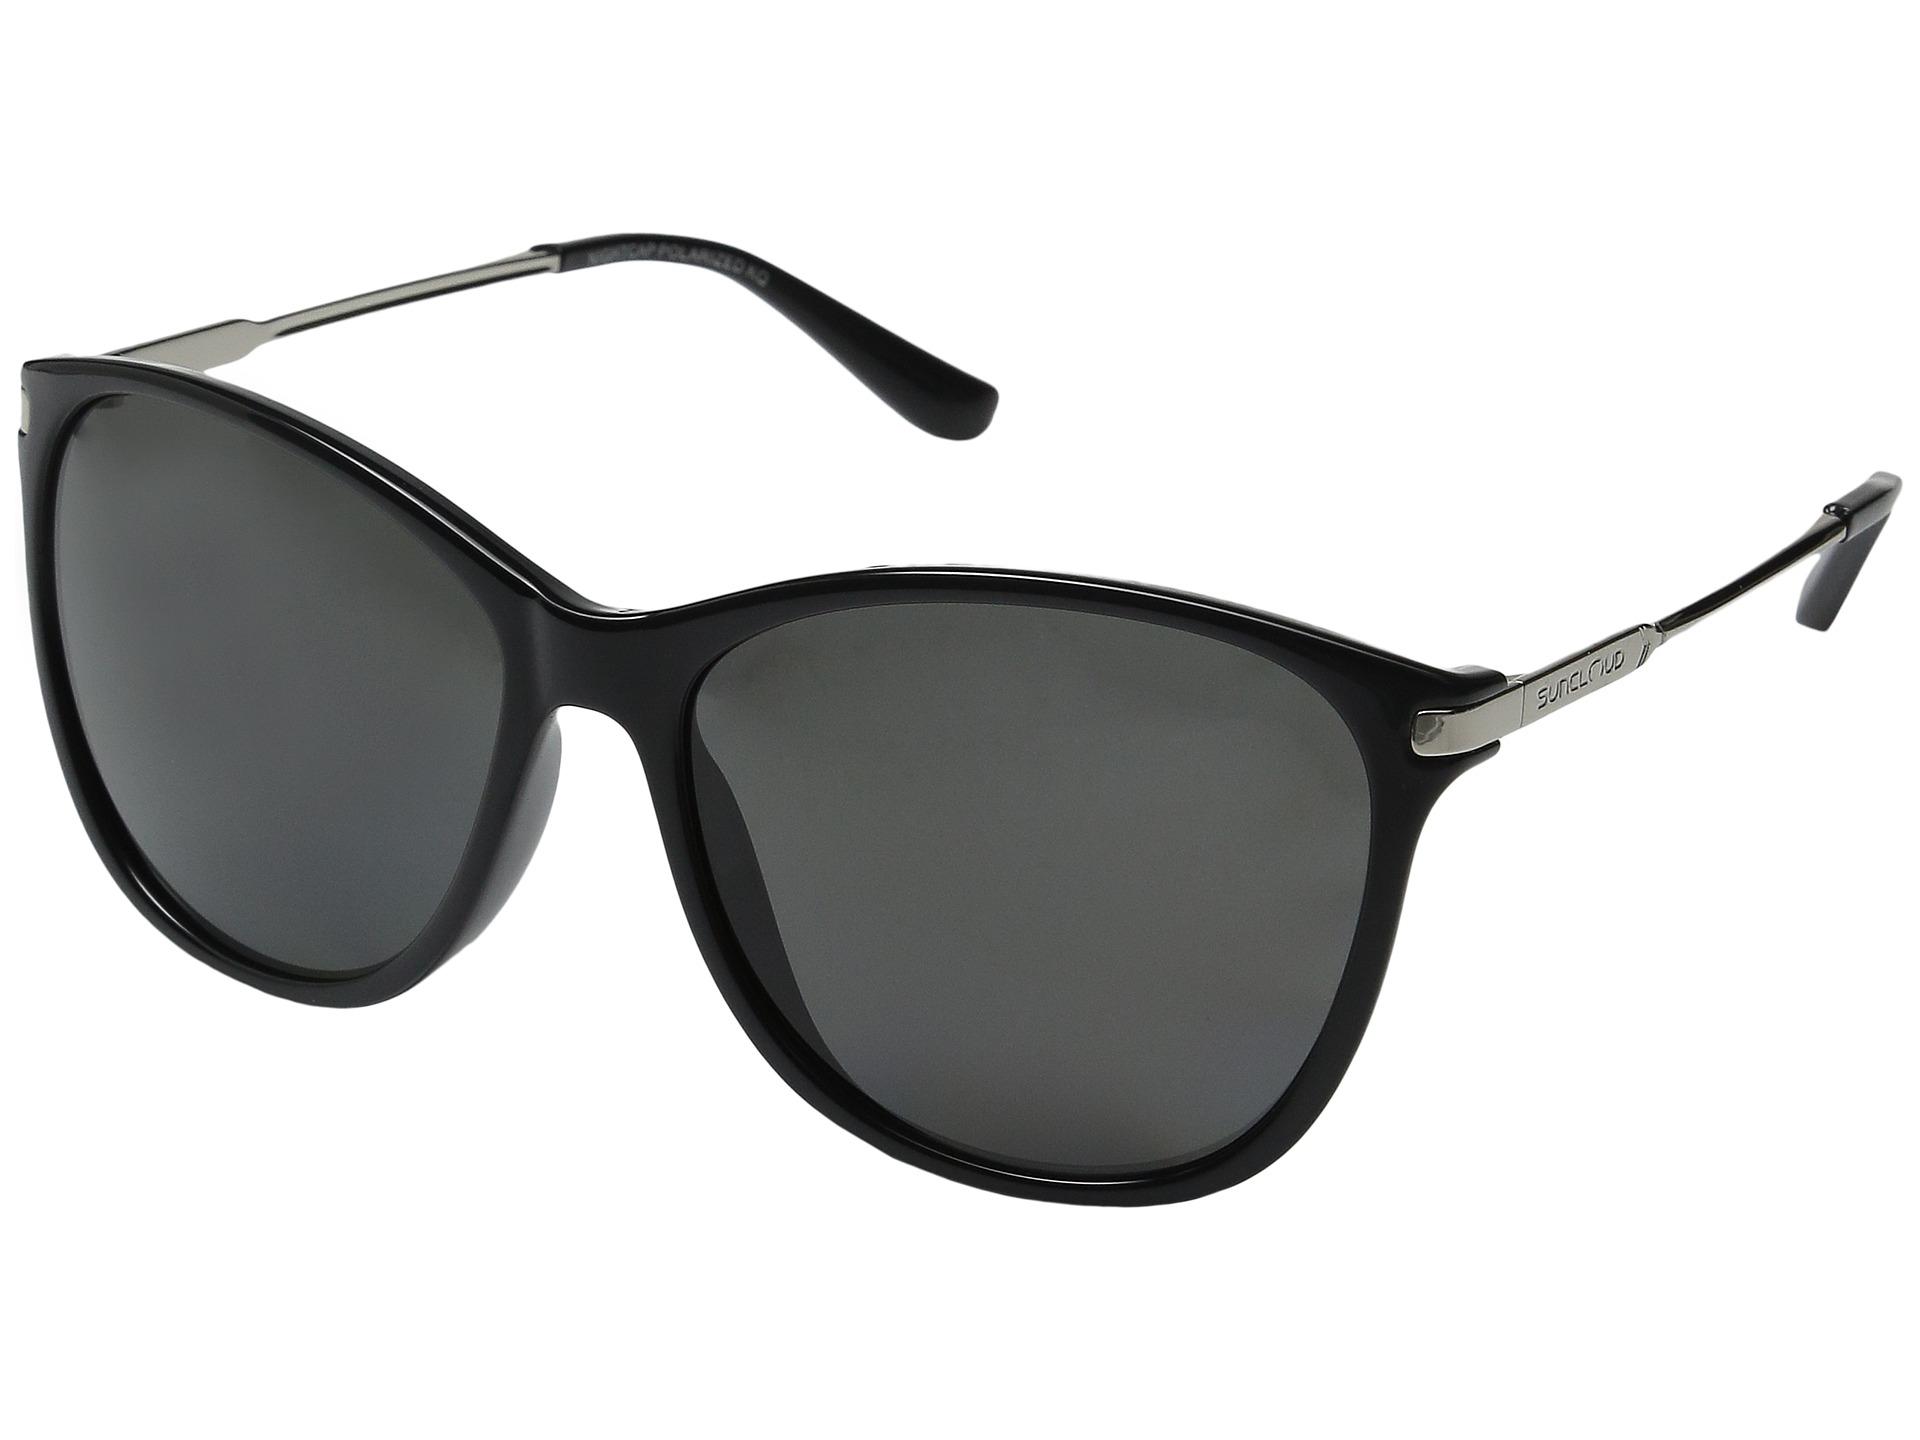 Suncloud Aviator Sunglasses  suncloud polarized optics nightcap zappos com free shipping both